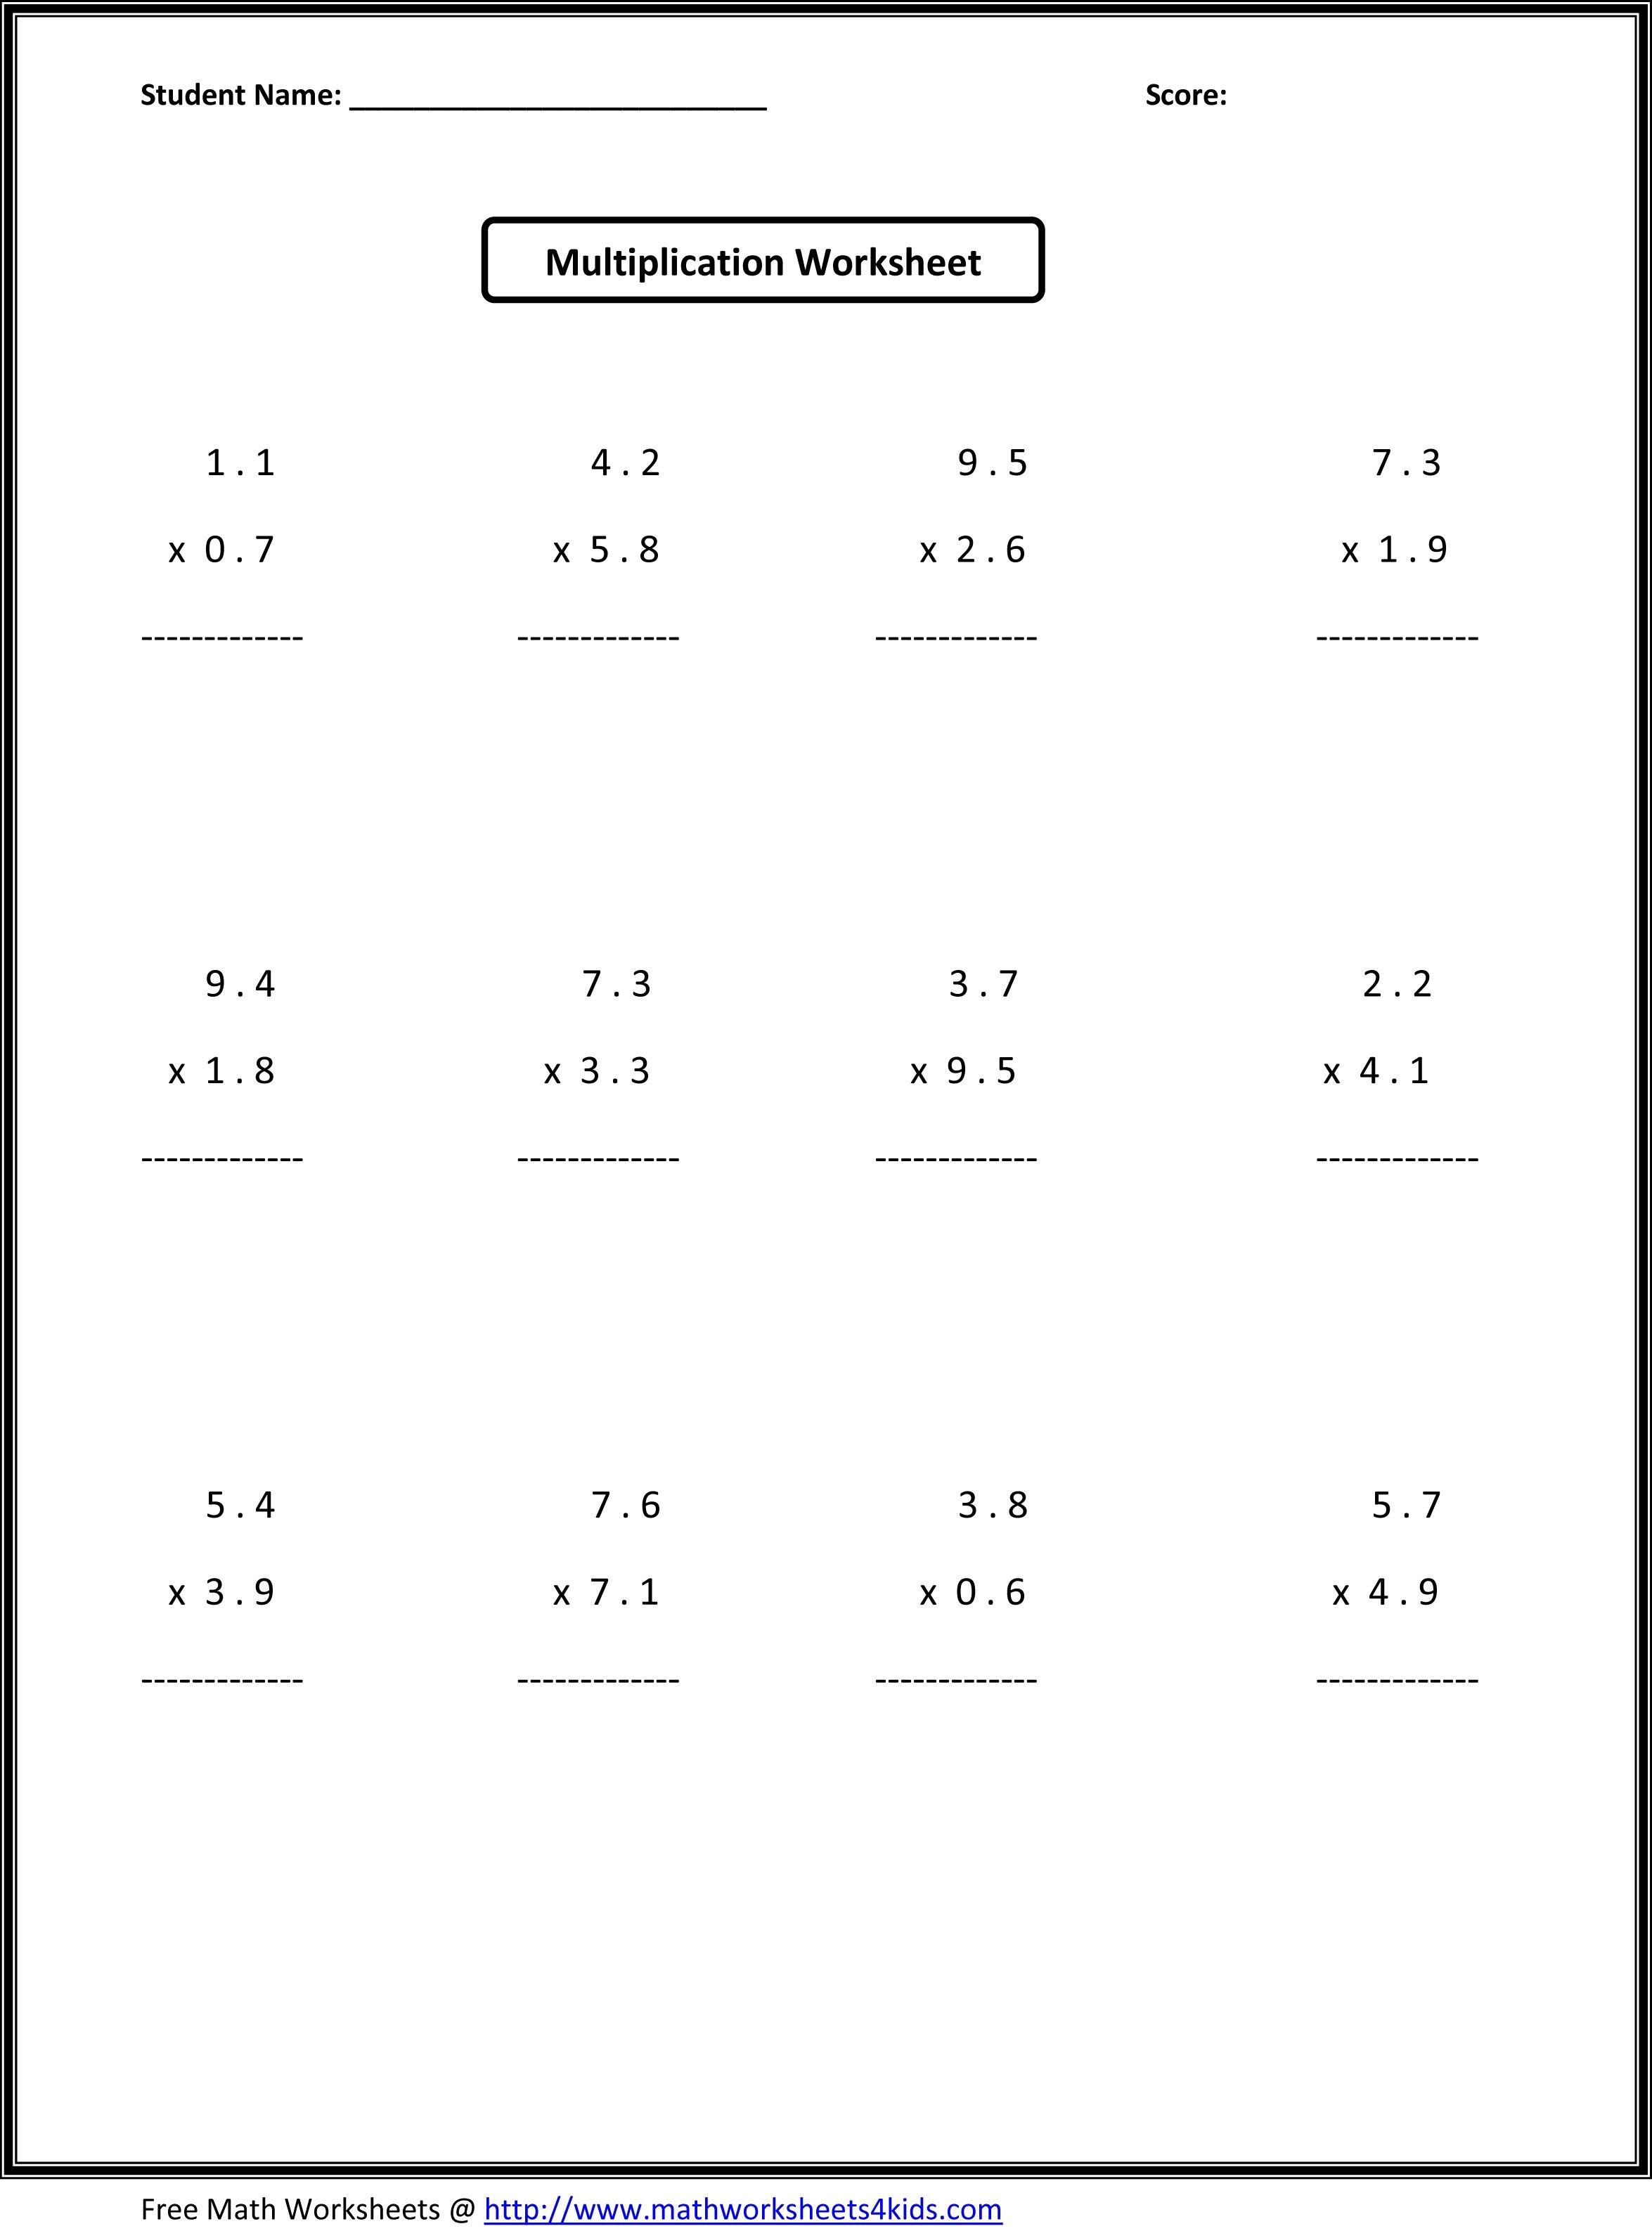 7Th Grade Math Worksheets | Value Worksheets Absolute Value - Multiplying Decimals Free Printable Worksheets